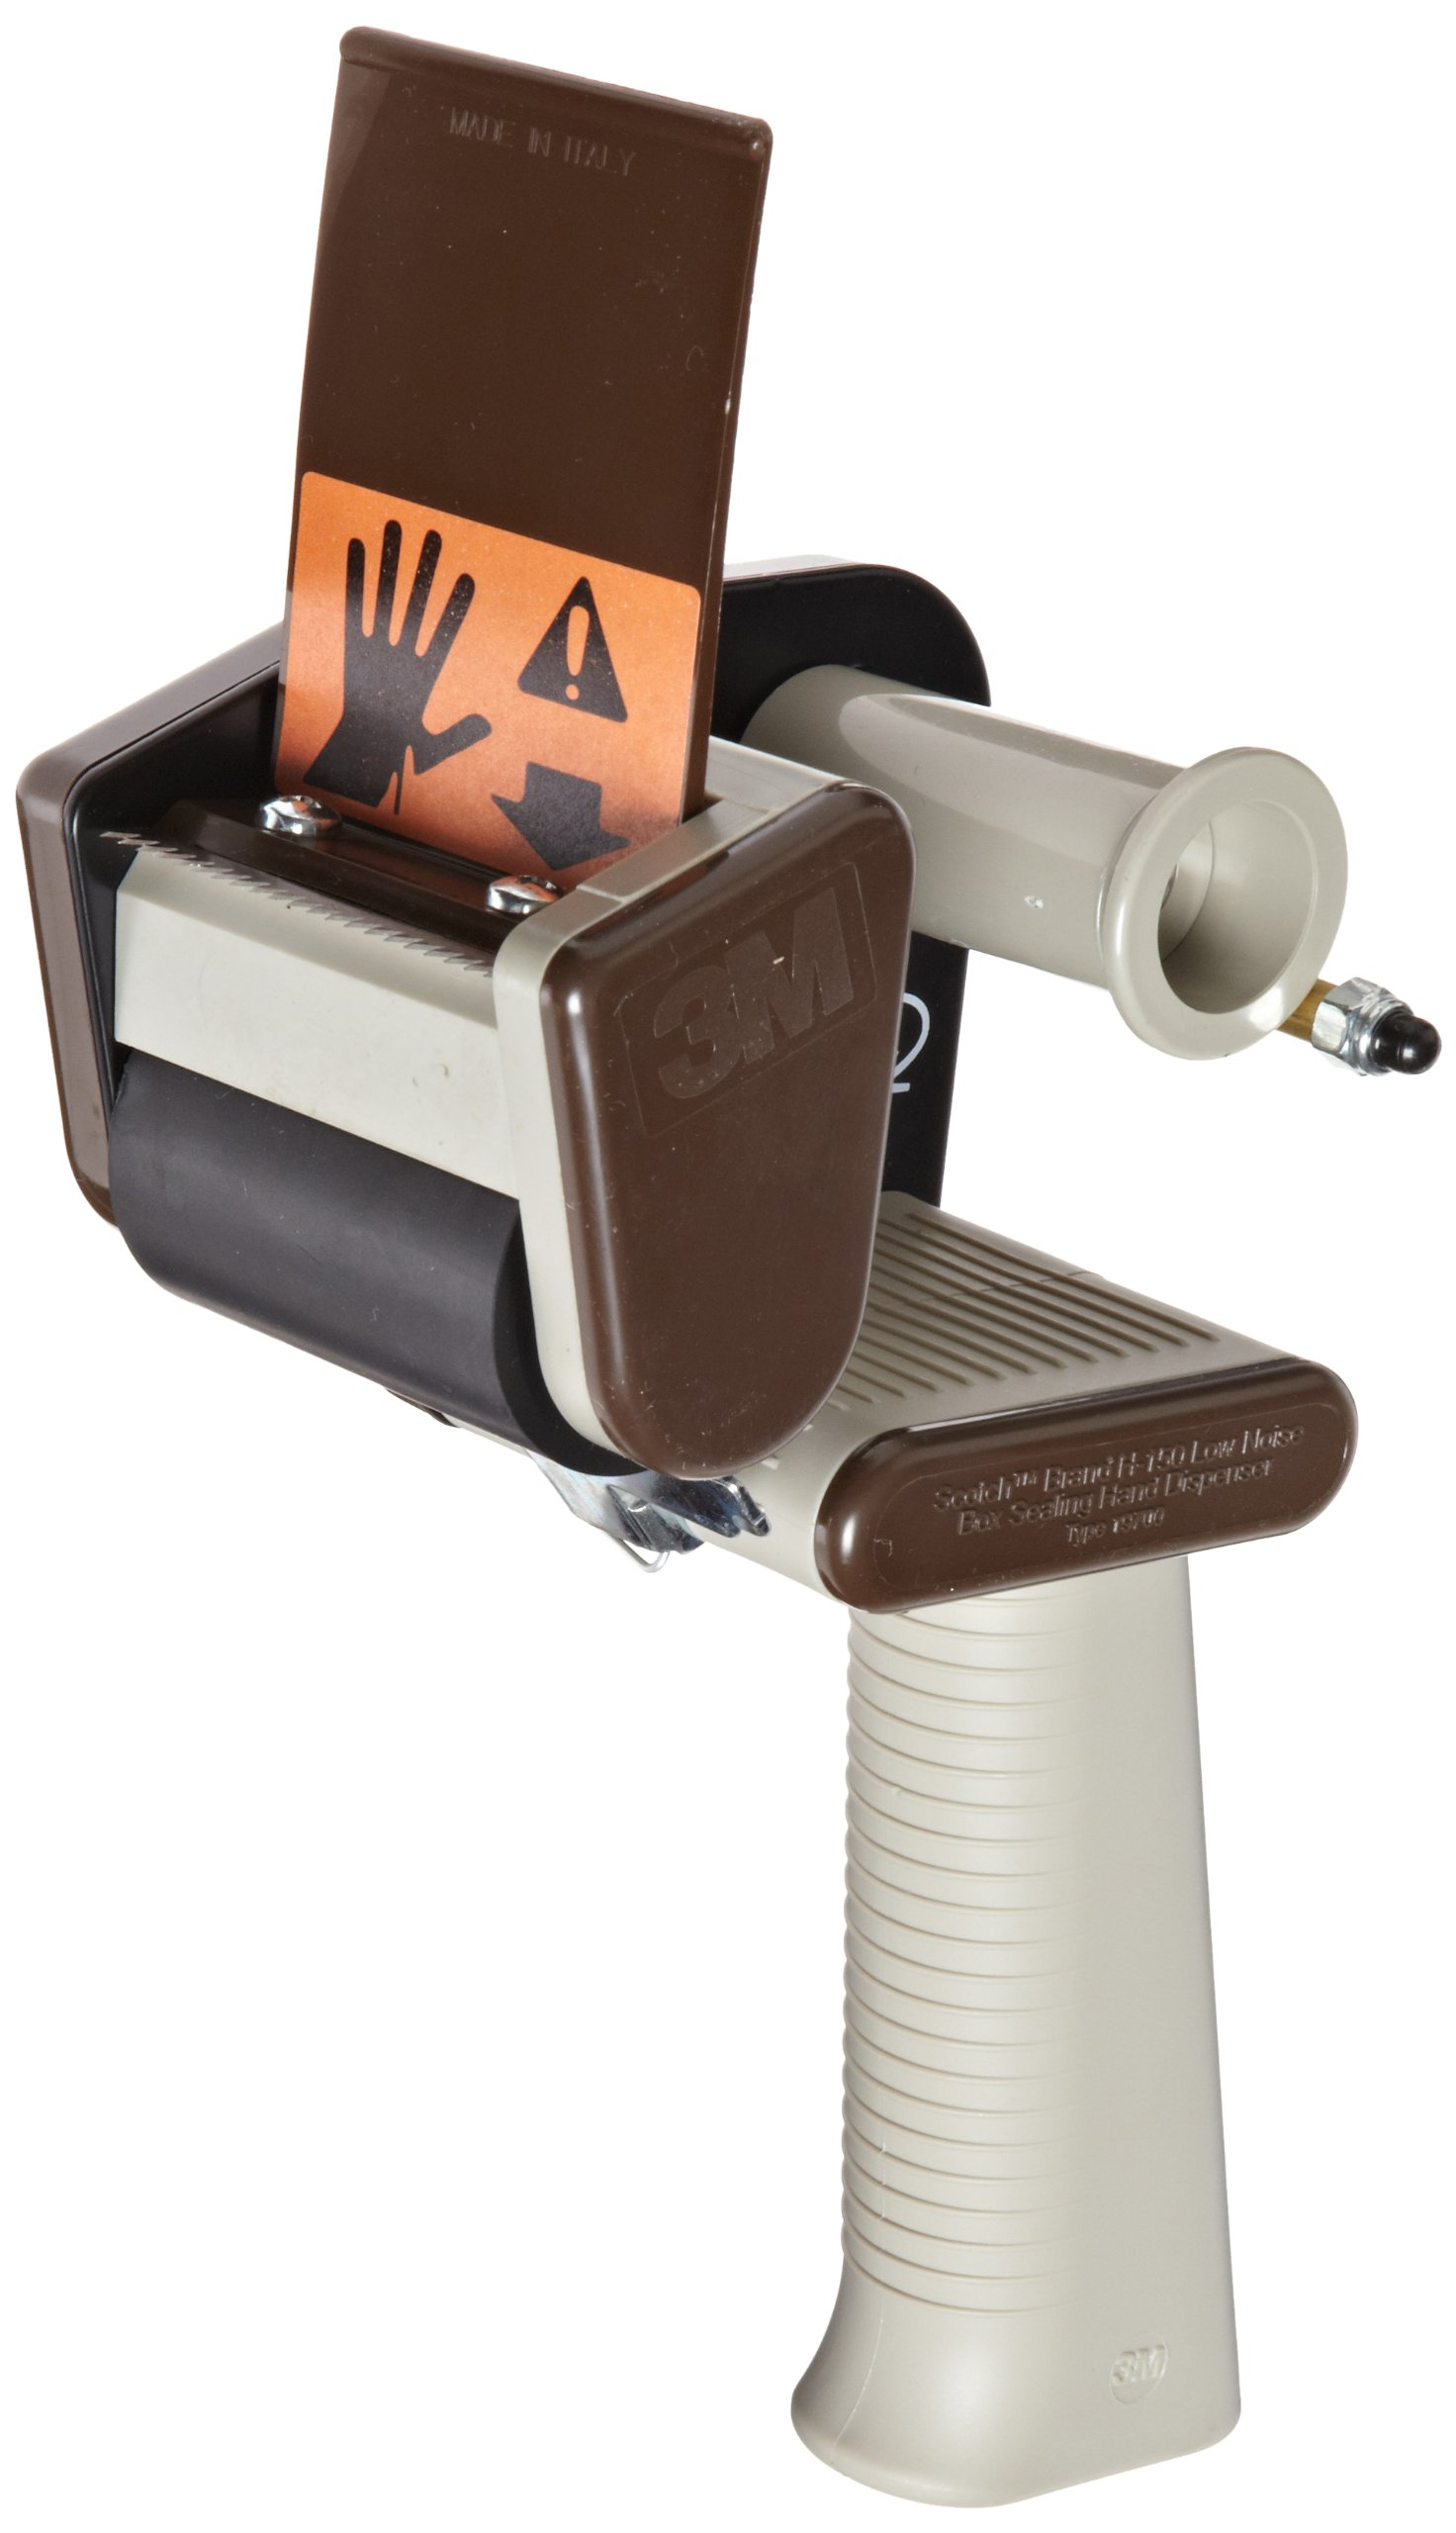 Scotch Low Noise Tape Dispenser H150, 48 mm by Scotch Brands